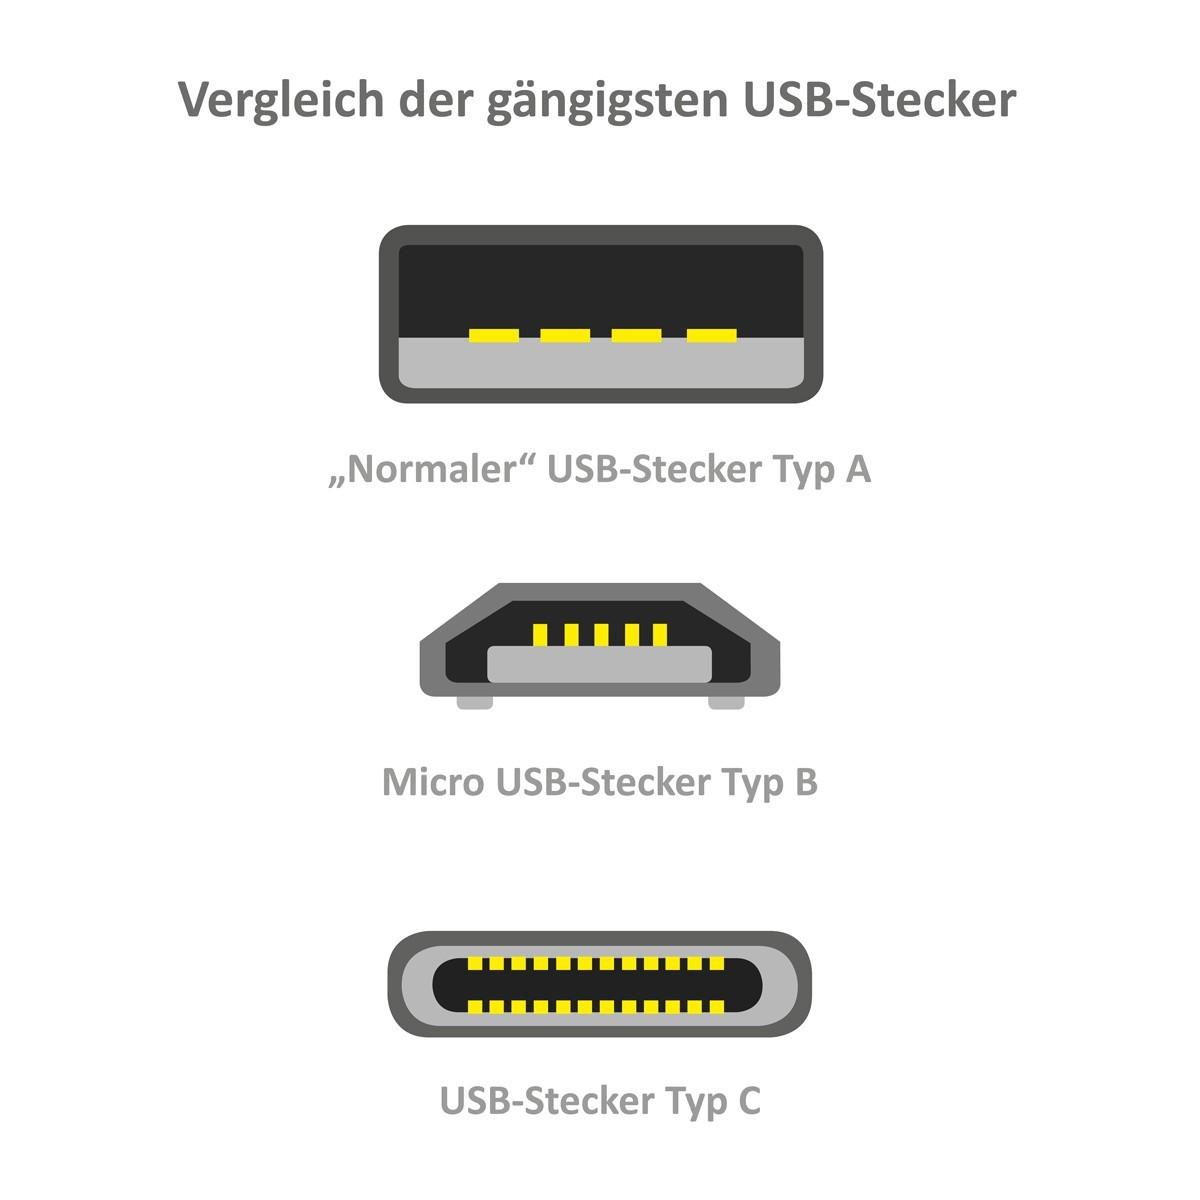 USB auf HDMI Kongqiabona-UK 0,5 m tragbares Ladekabel Ladekabel. hohe Pr/äzision